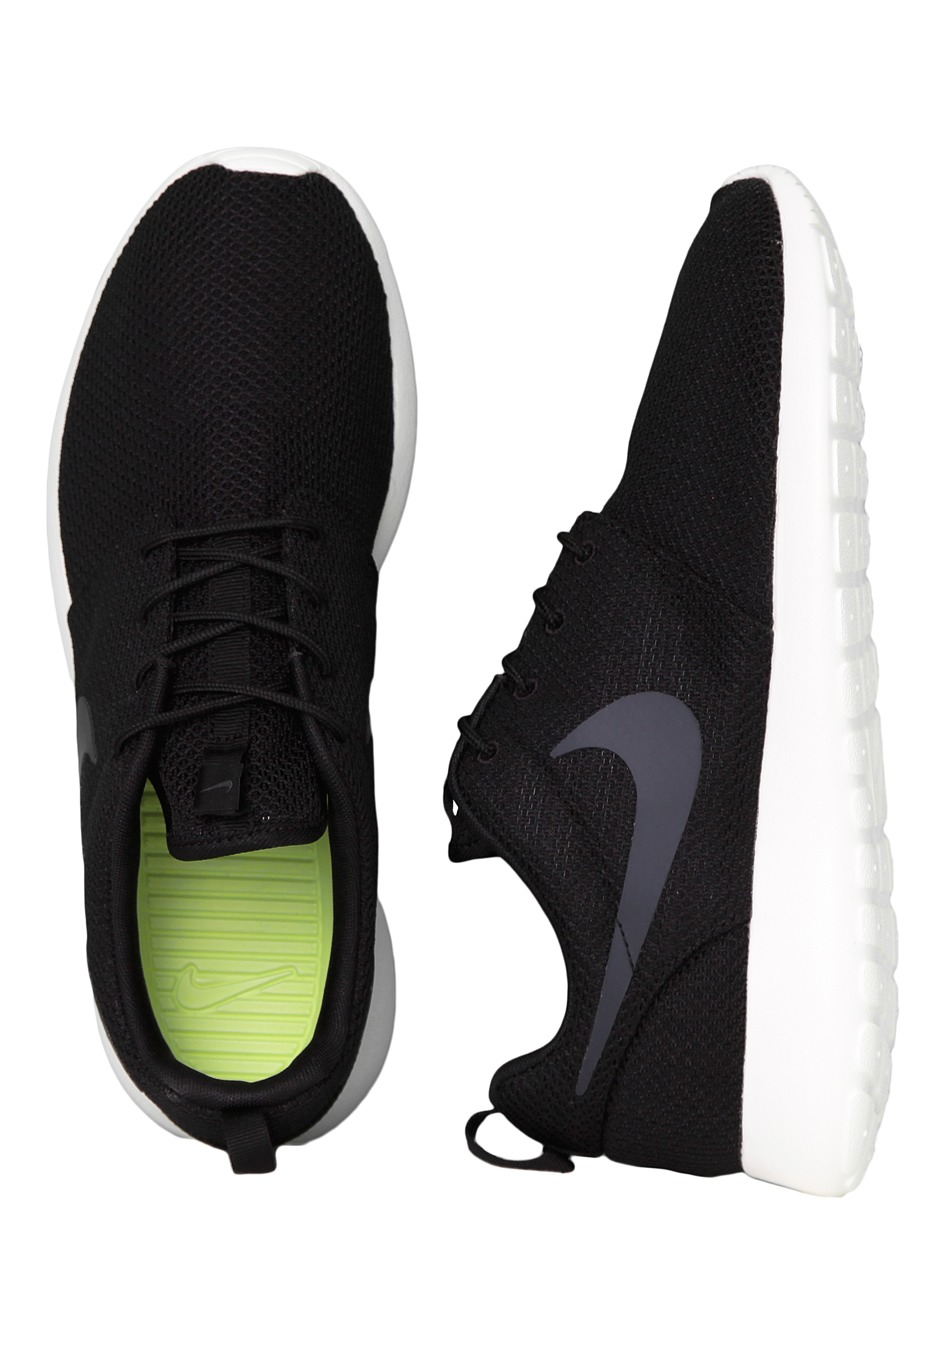 Nike Roshe One (Black Anthracite Sail)